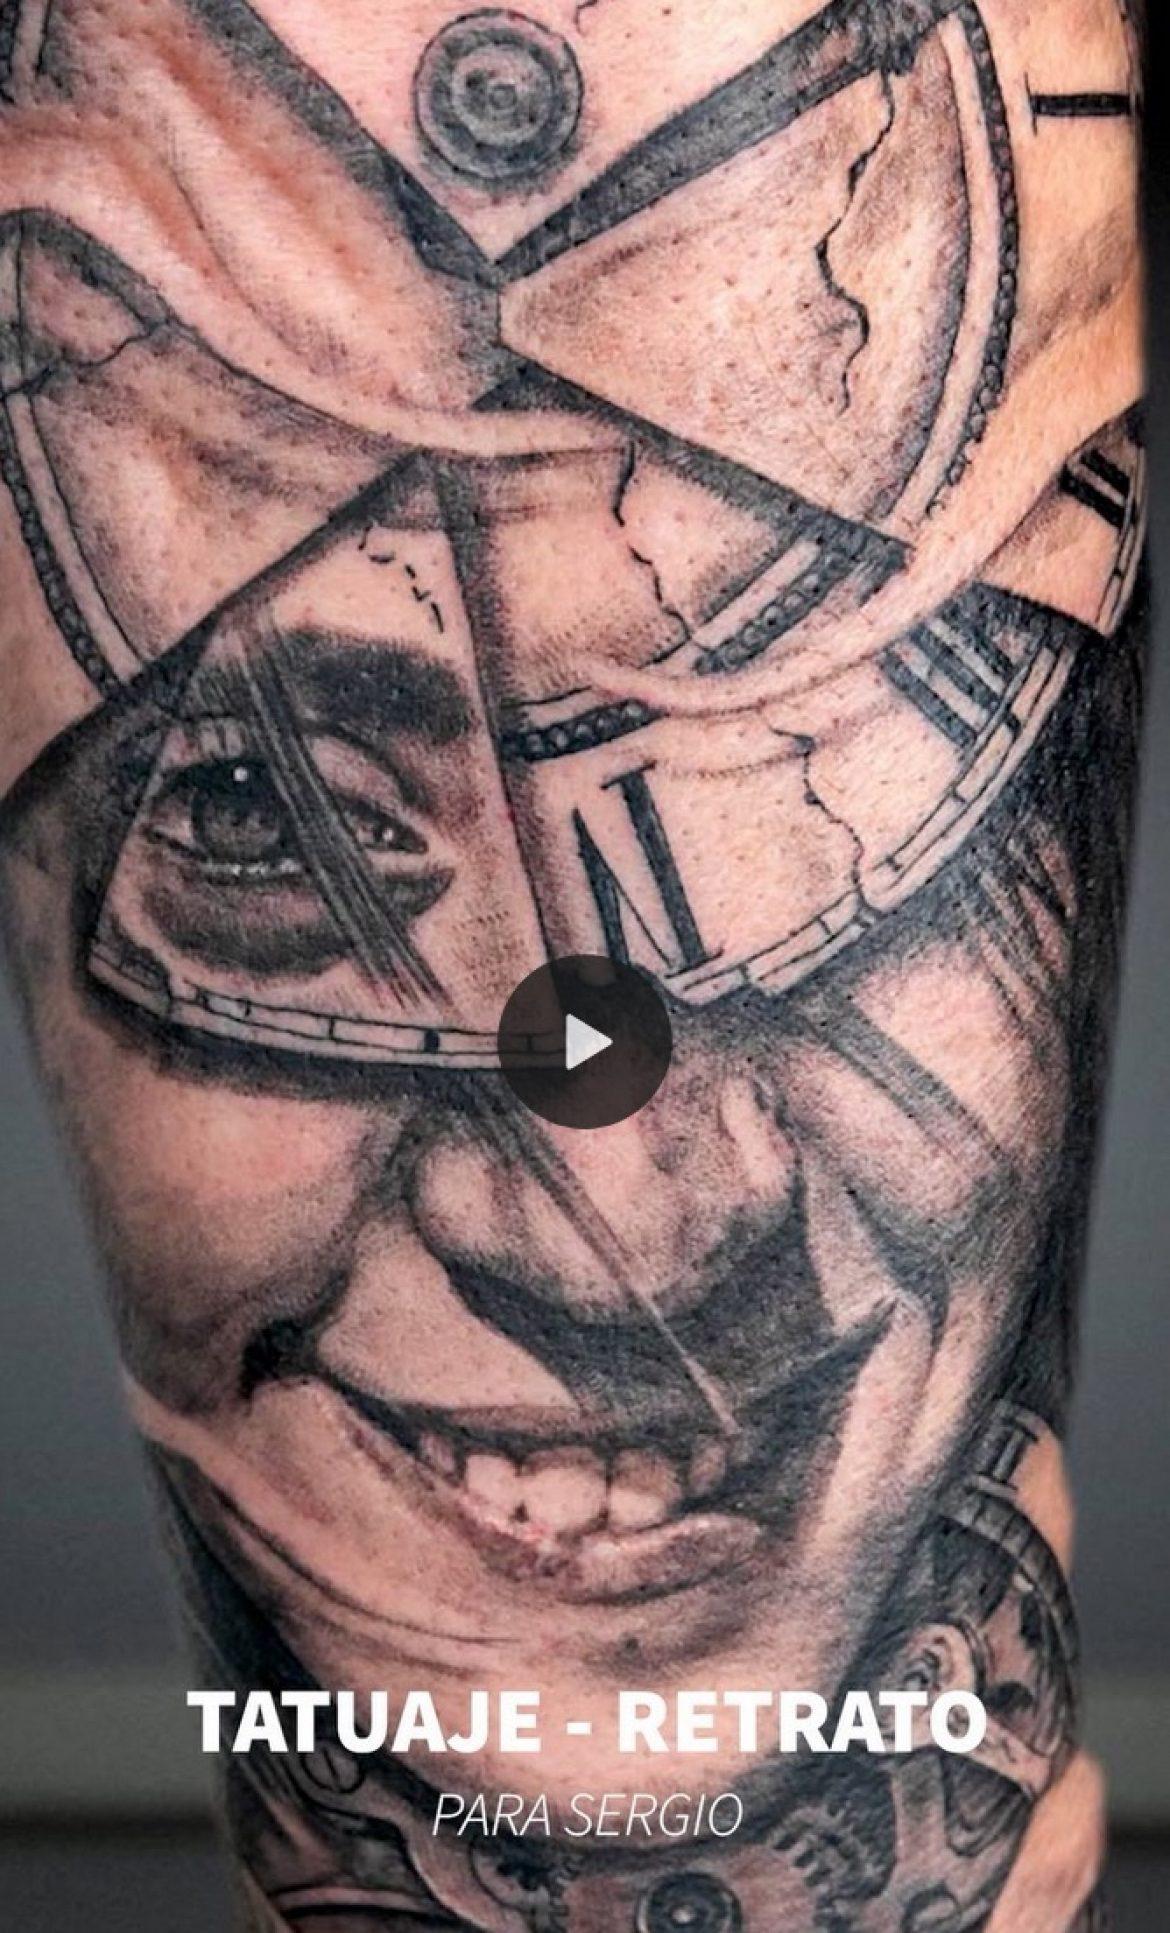 tatuaje Retrato mujer - ruth cuervilu tattoo - km13 studio - estudio de tatuajes en astrabudua erandio bizkaia bilbao getxo